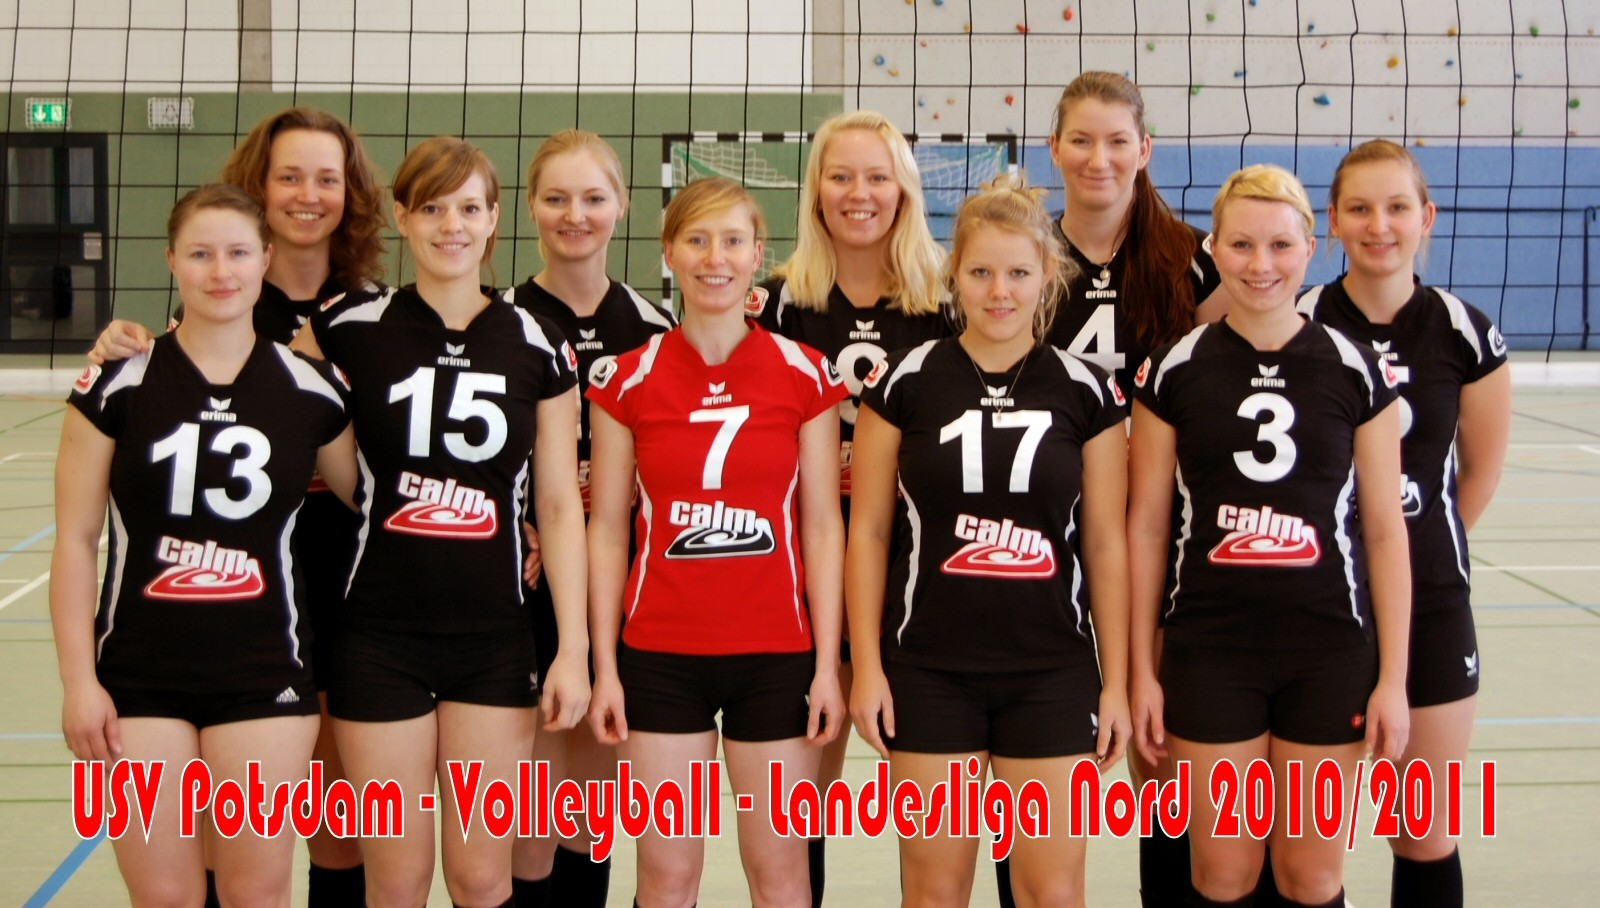 Landesliga Nord 2010/2011